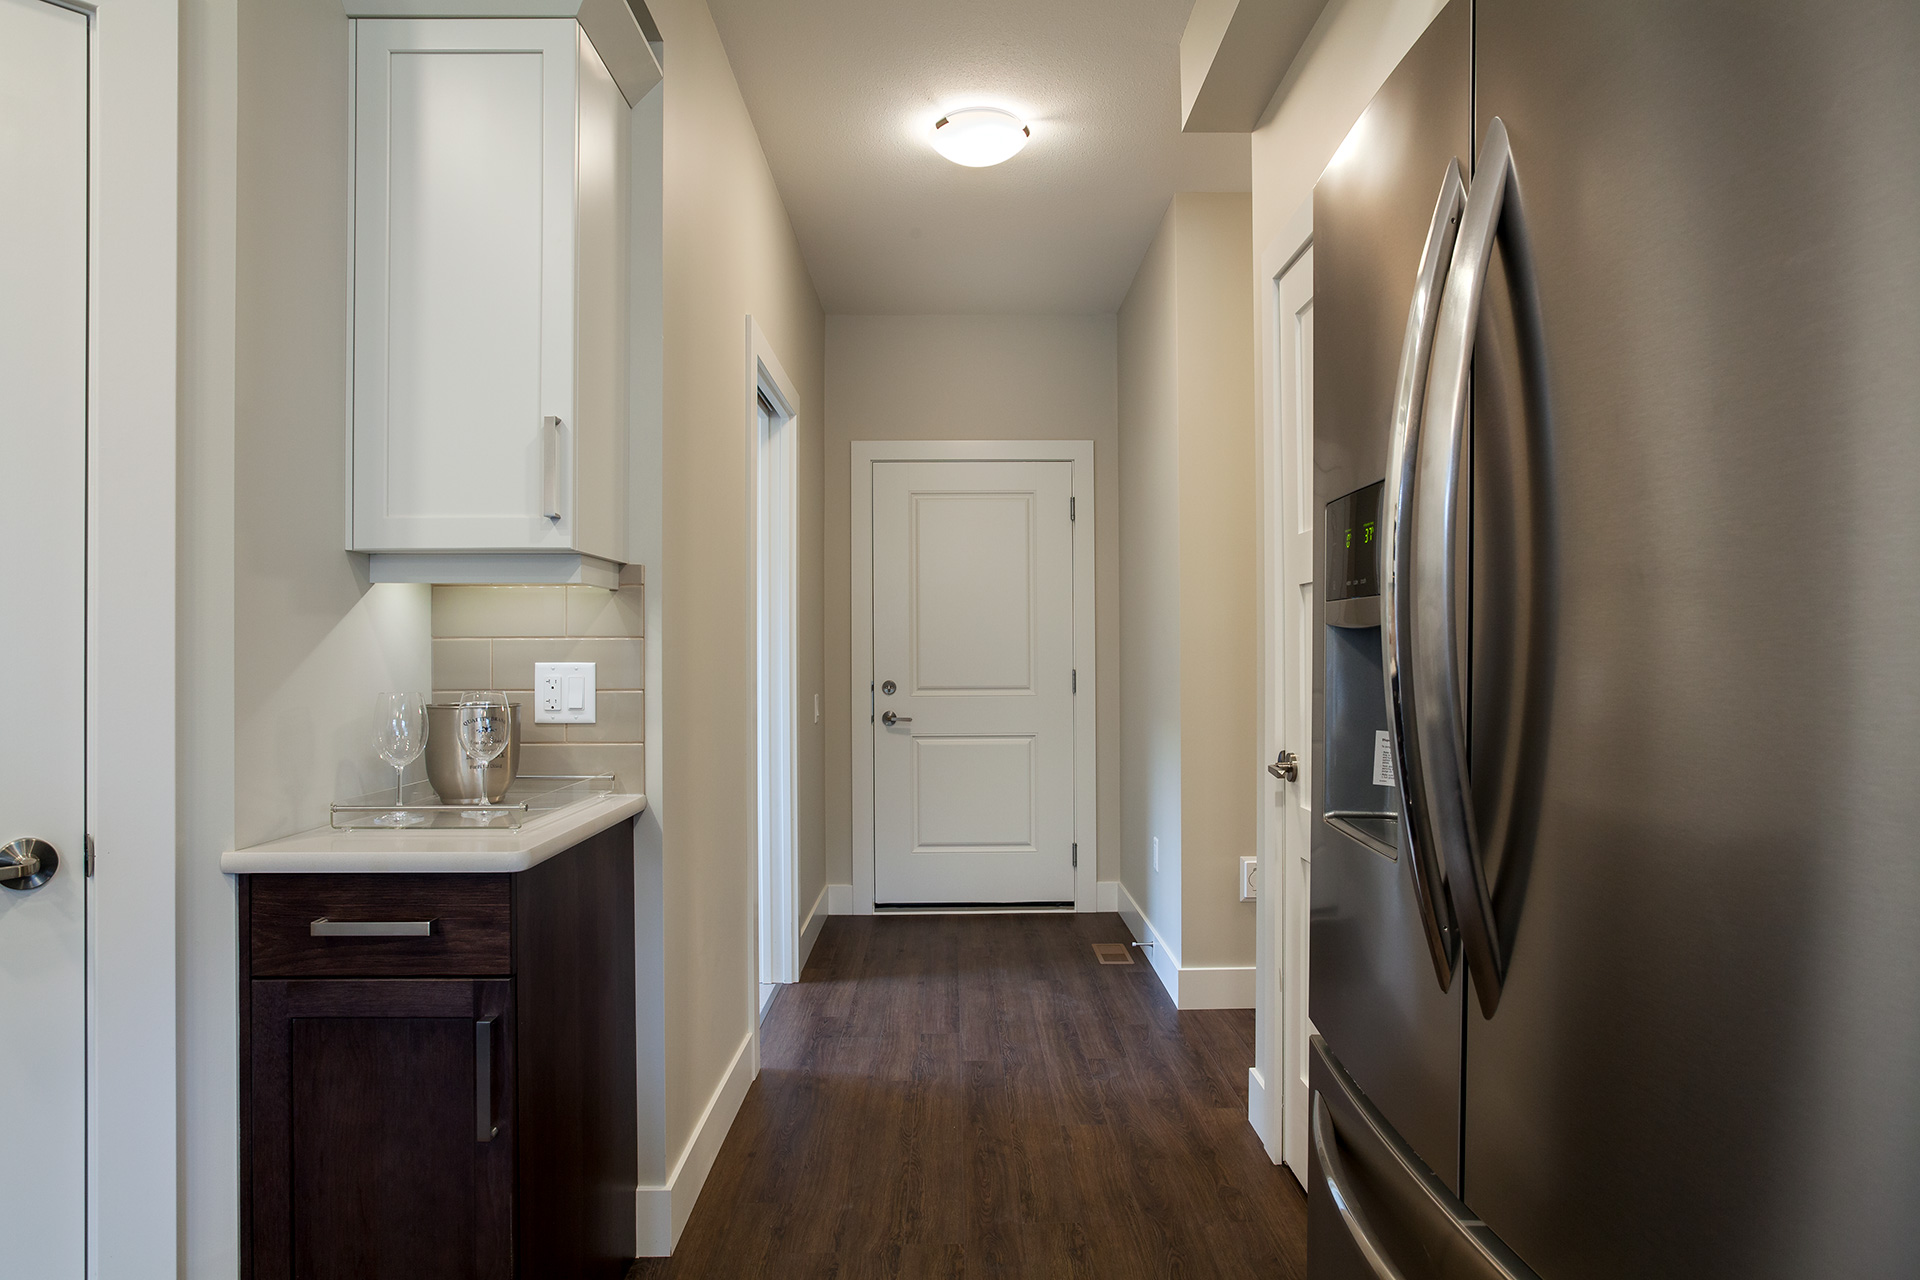 Hallway to garage & laundry